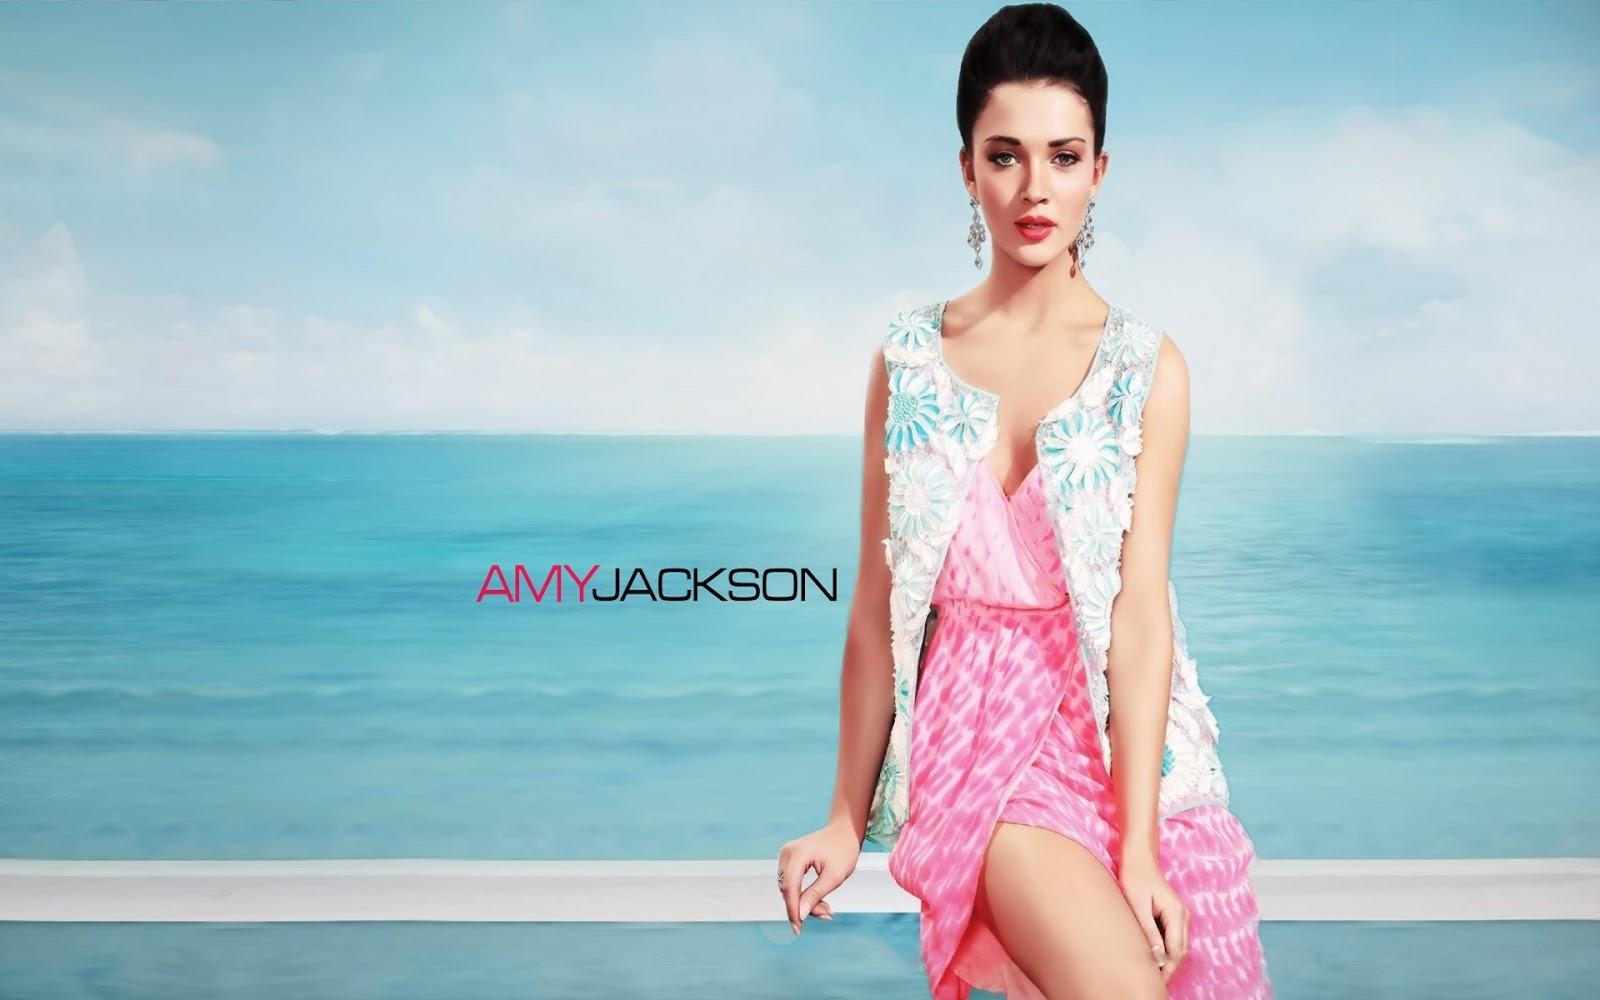 amy jackson wallpapers free